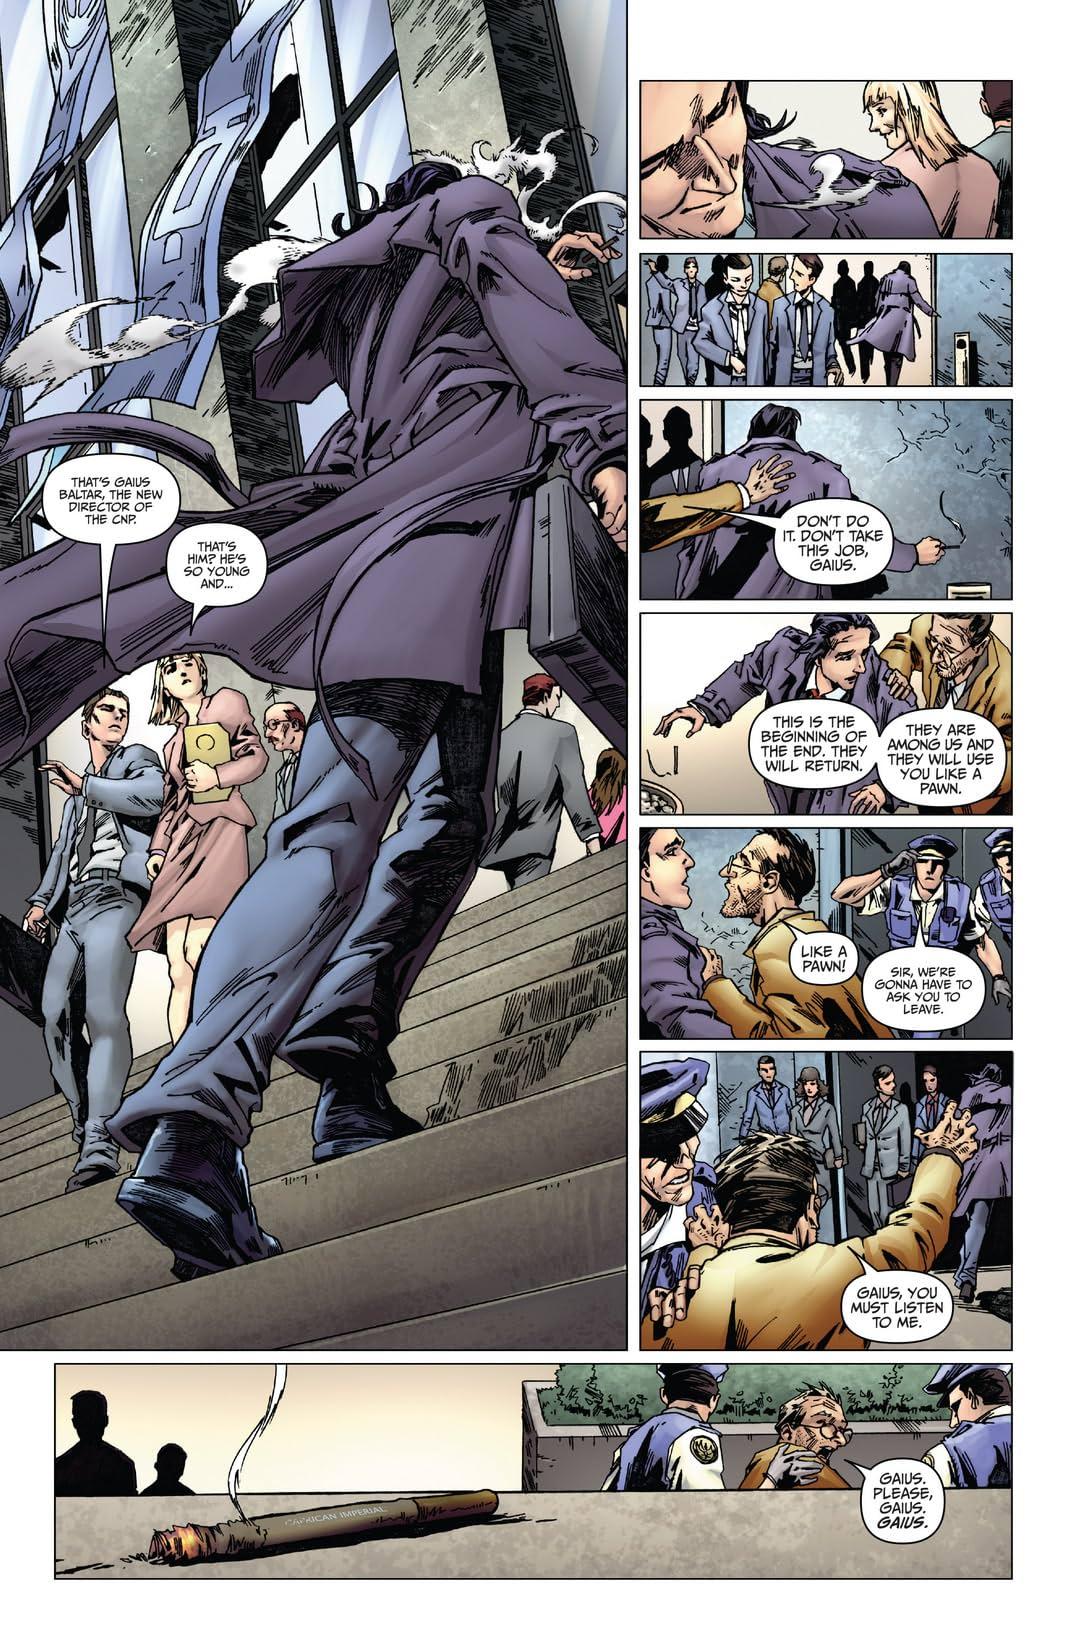 Battlestar Galactica: Origins #2